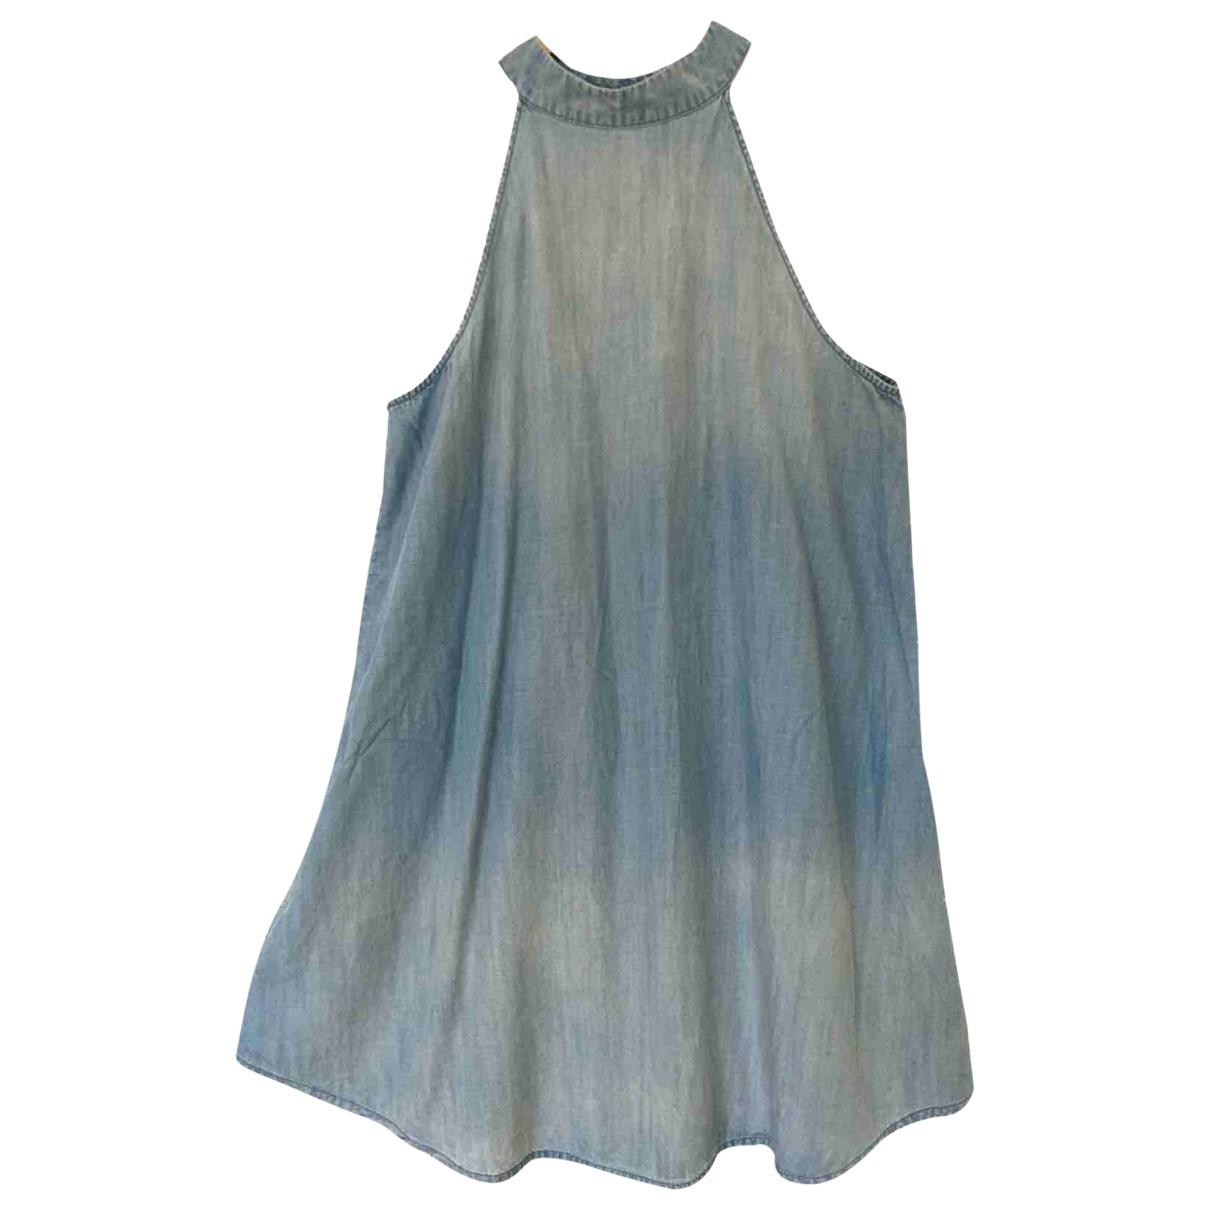 Anthropologie - Robe   pour femme en coton - elasthane - bleu